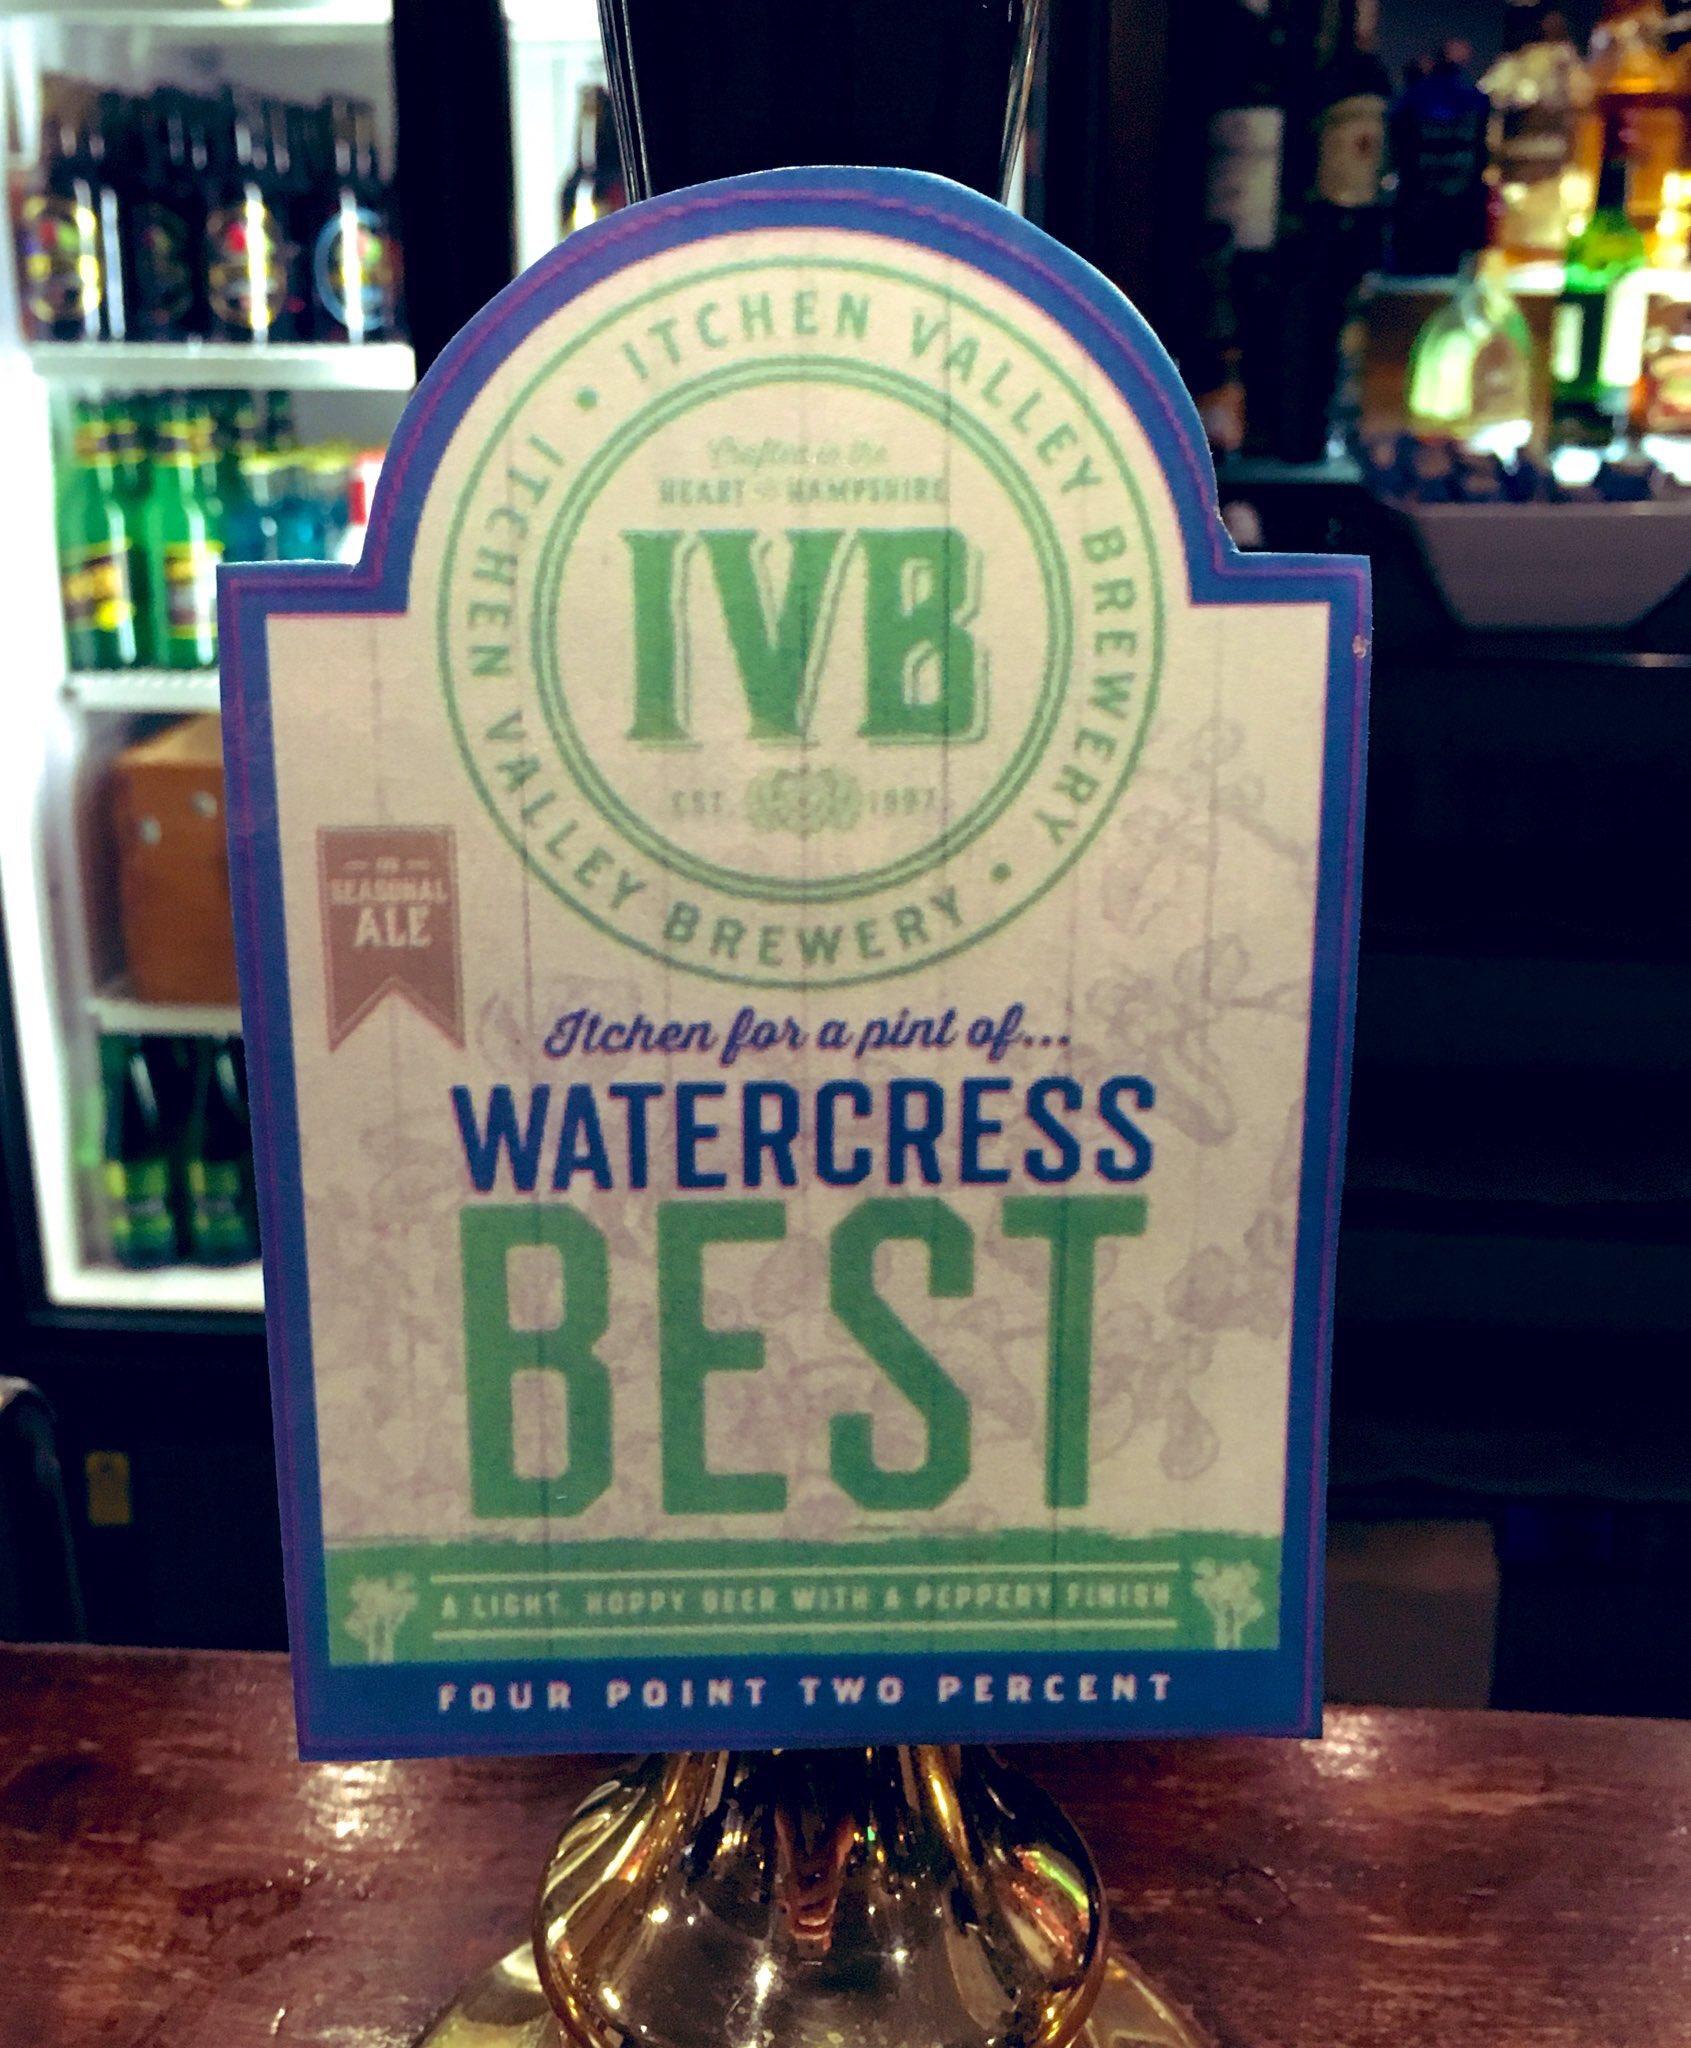 198: Watercress Best